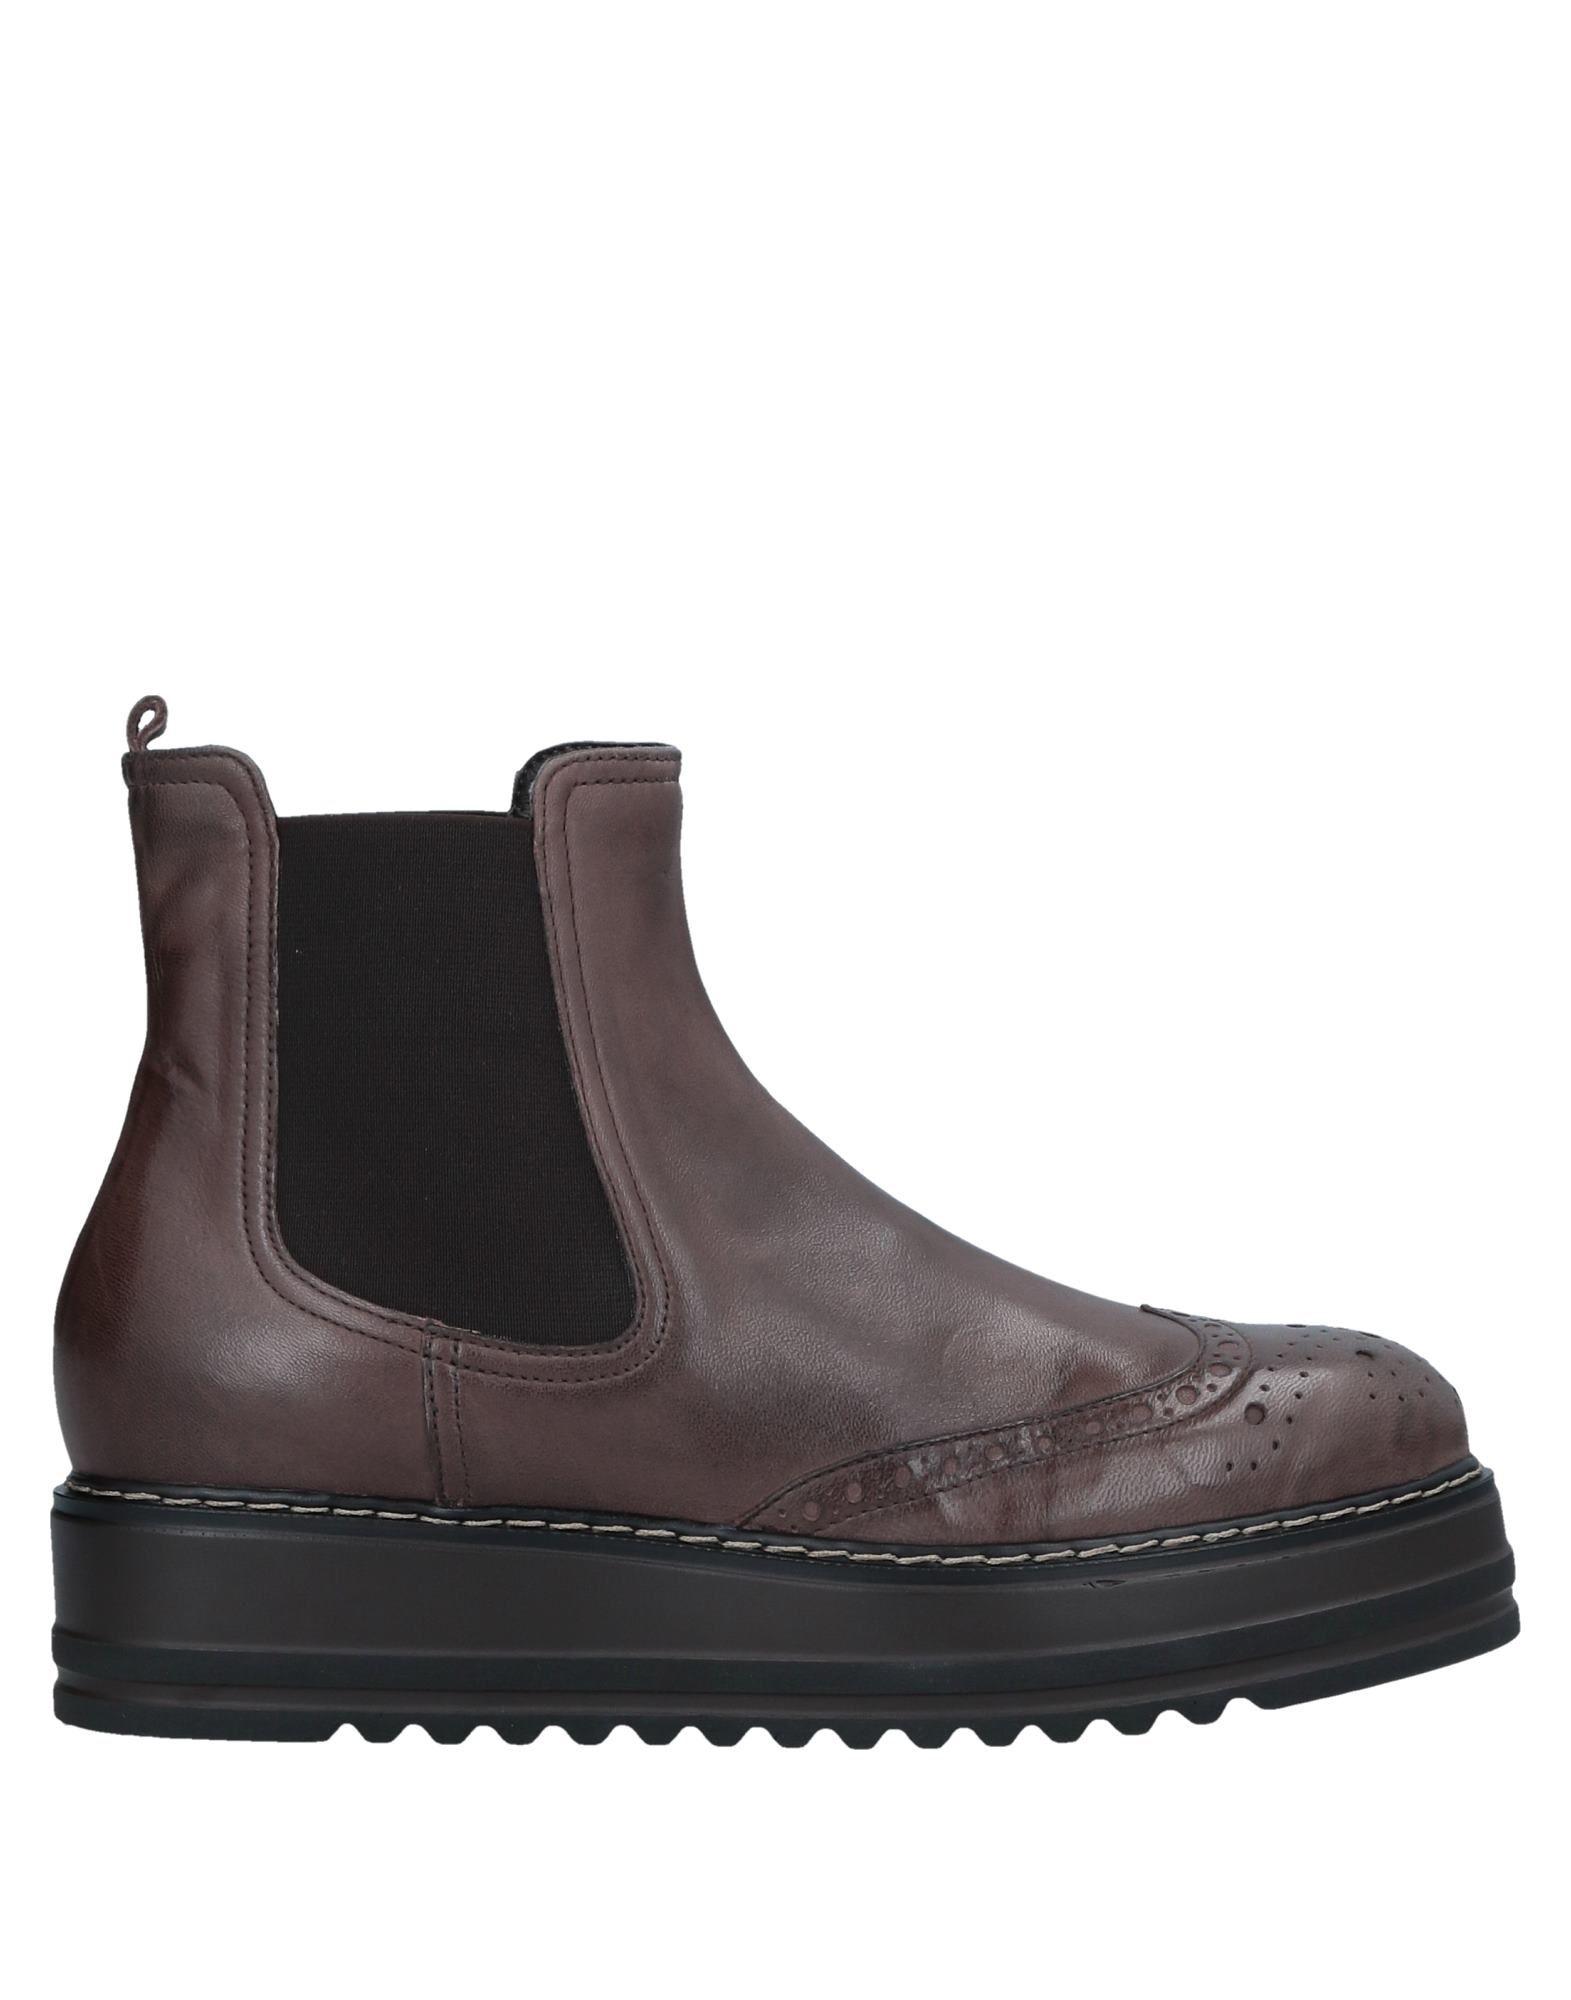 Chelsea Boots Eliana Bucci Donna - 11533069FJ